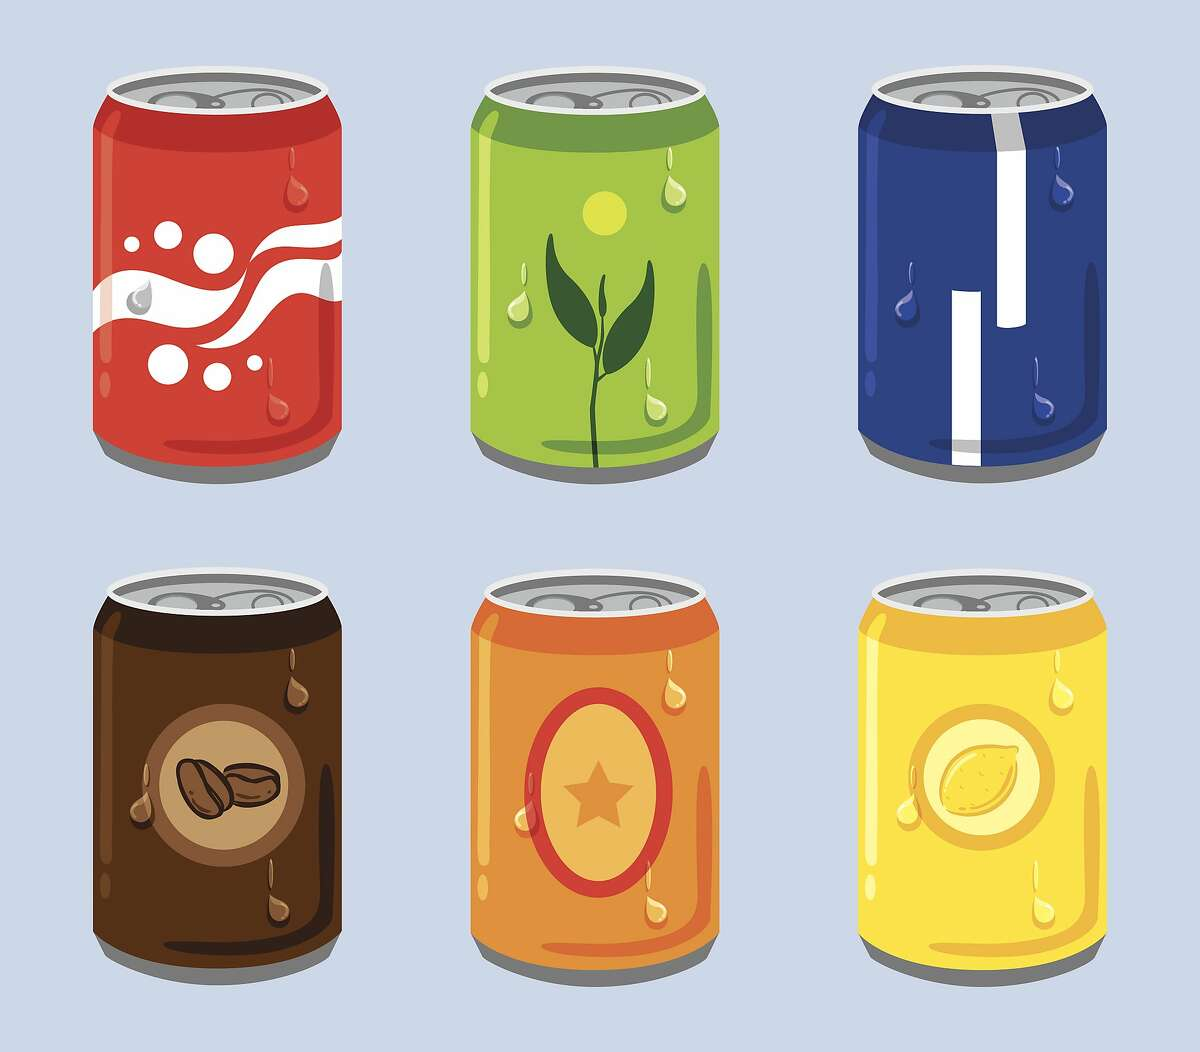 Hard coffee, hard tea, hard seltzer and hard kombucha are among the big drink trends right now.